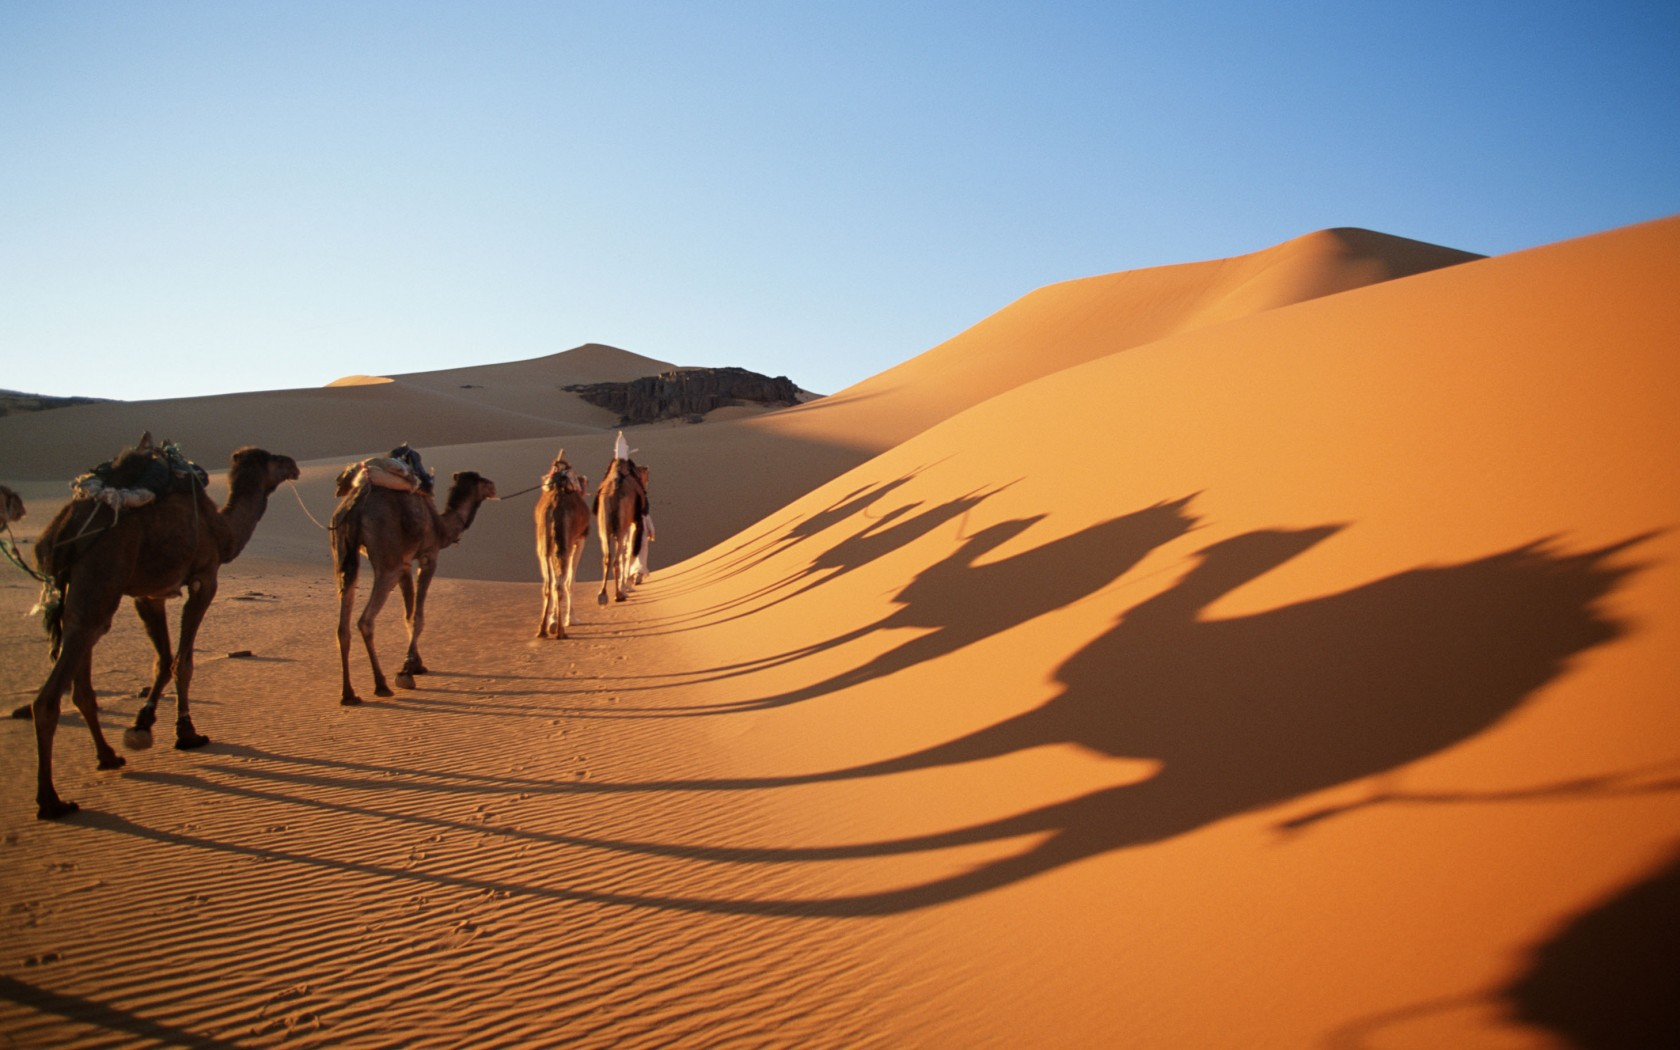 Camel drivers crossing sand dunes, Sahara Desert, Algeria